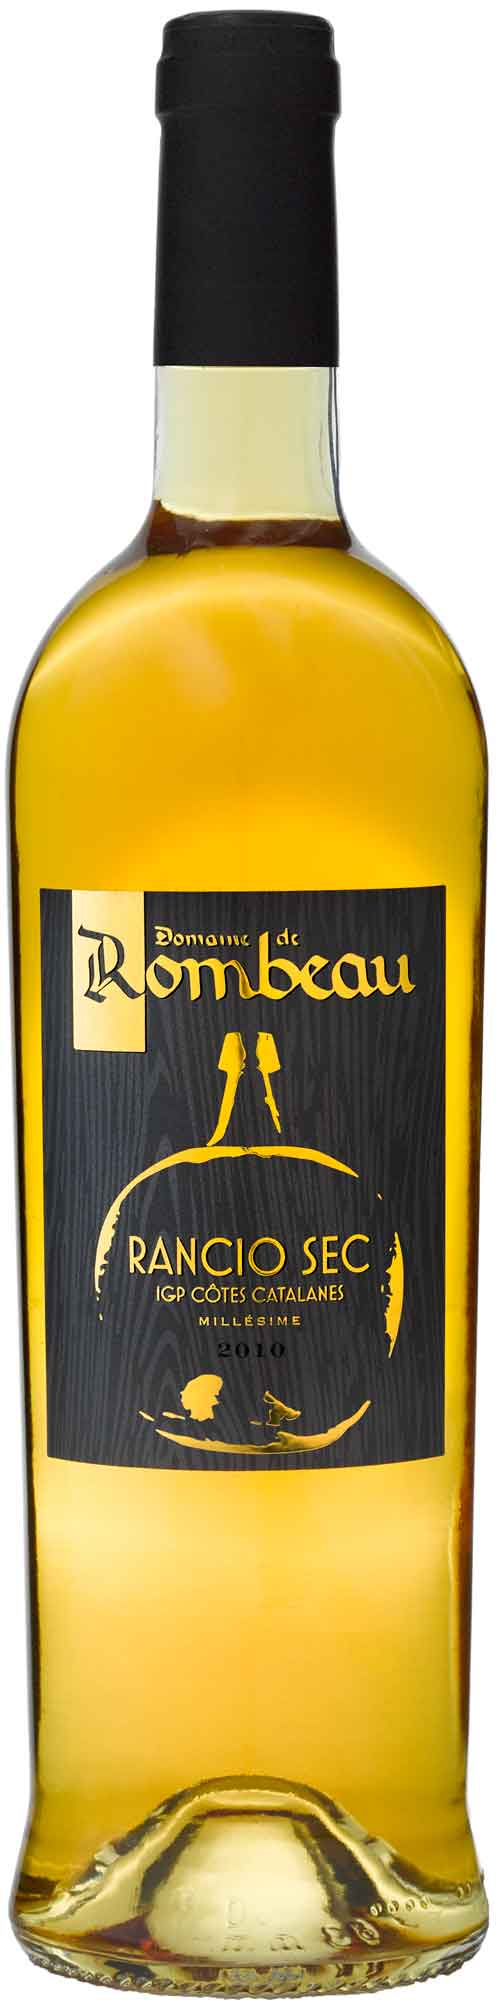 Domaine de Rombeau Rancio Sec 2010